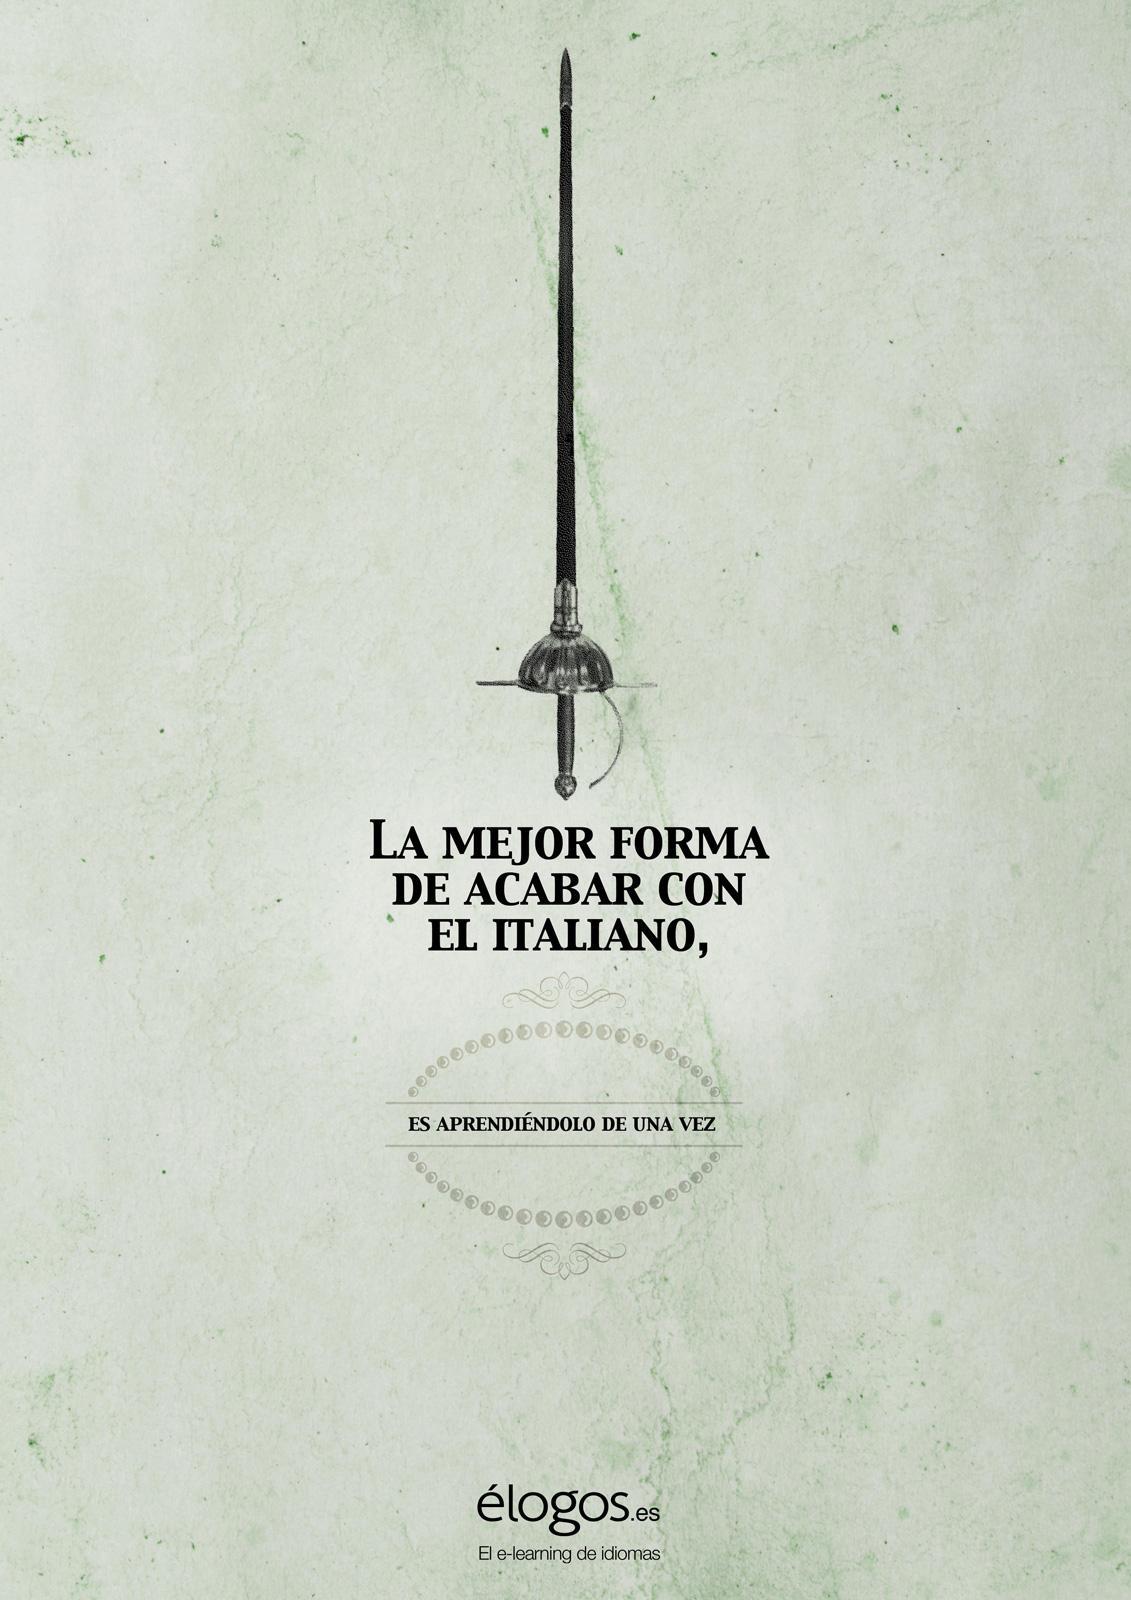 élogos.es Print Ad -  Italian